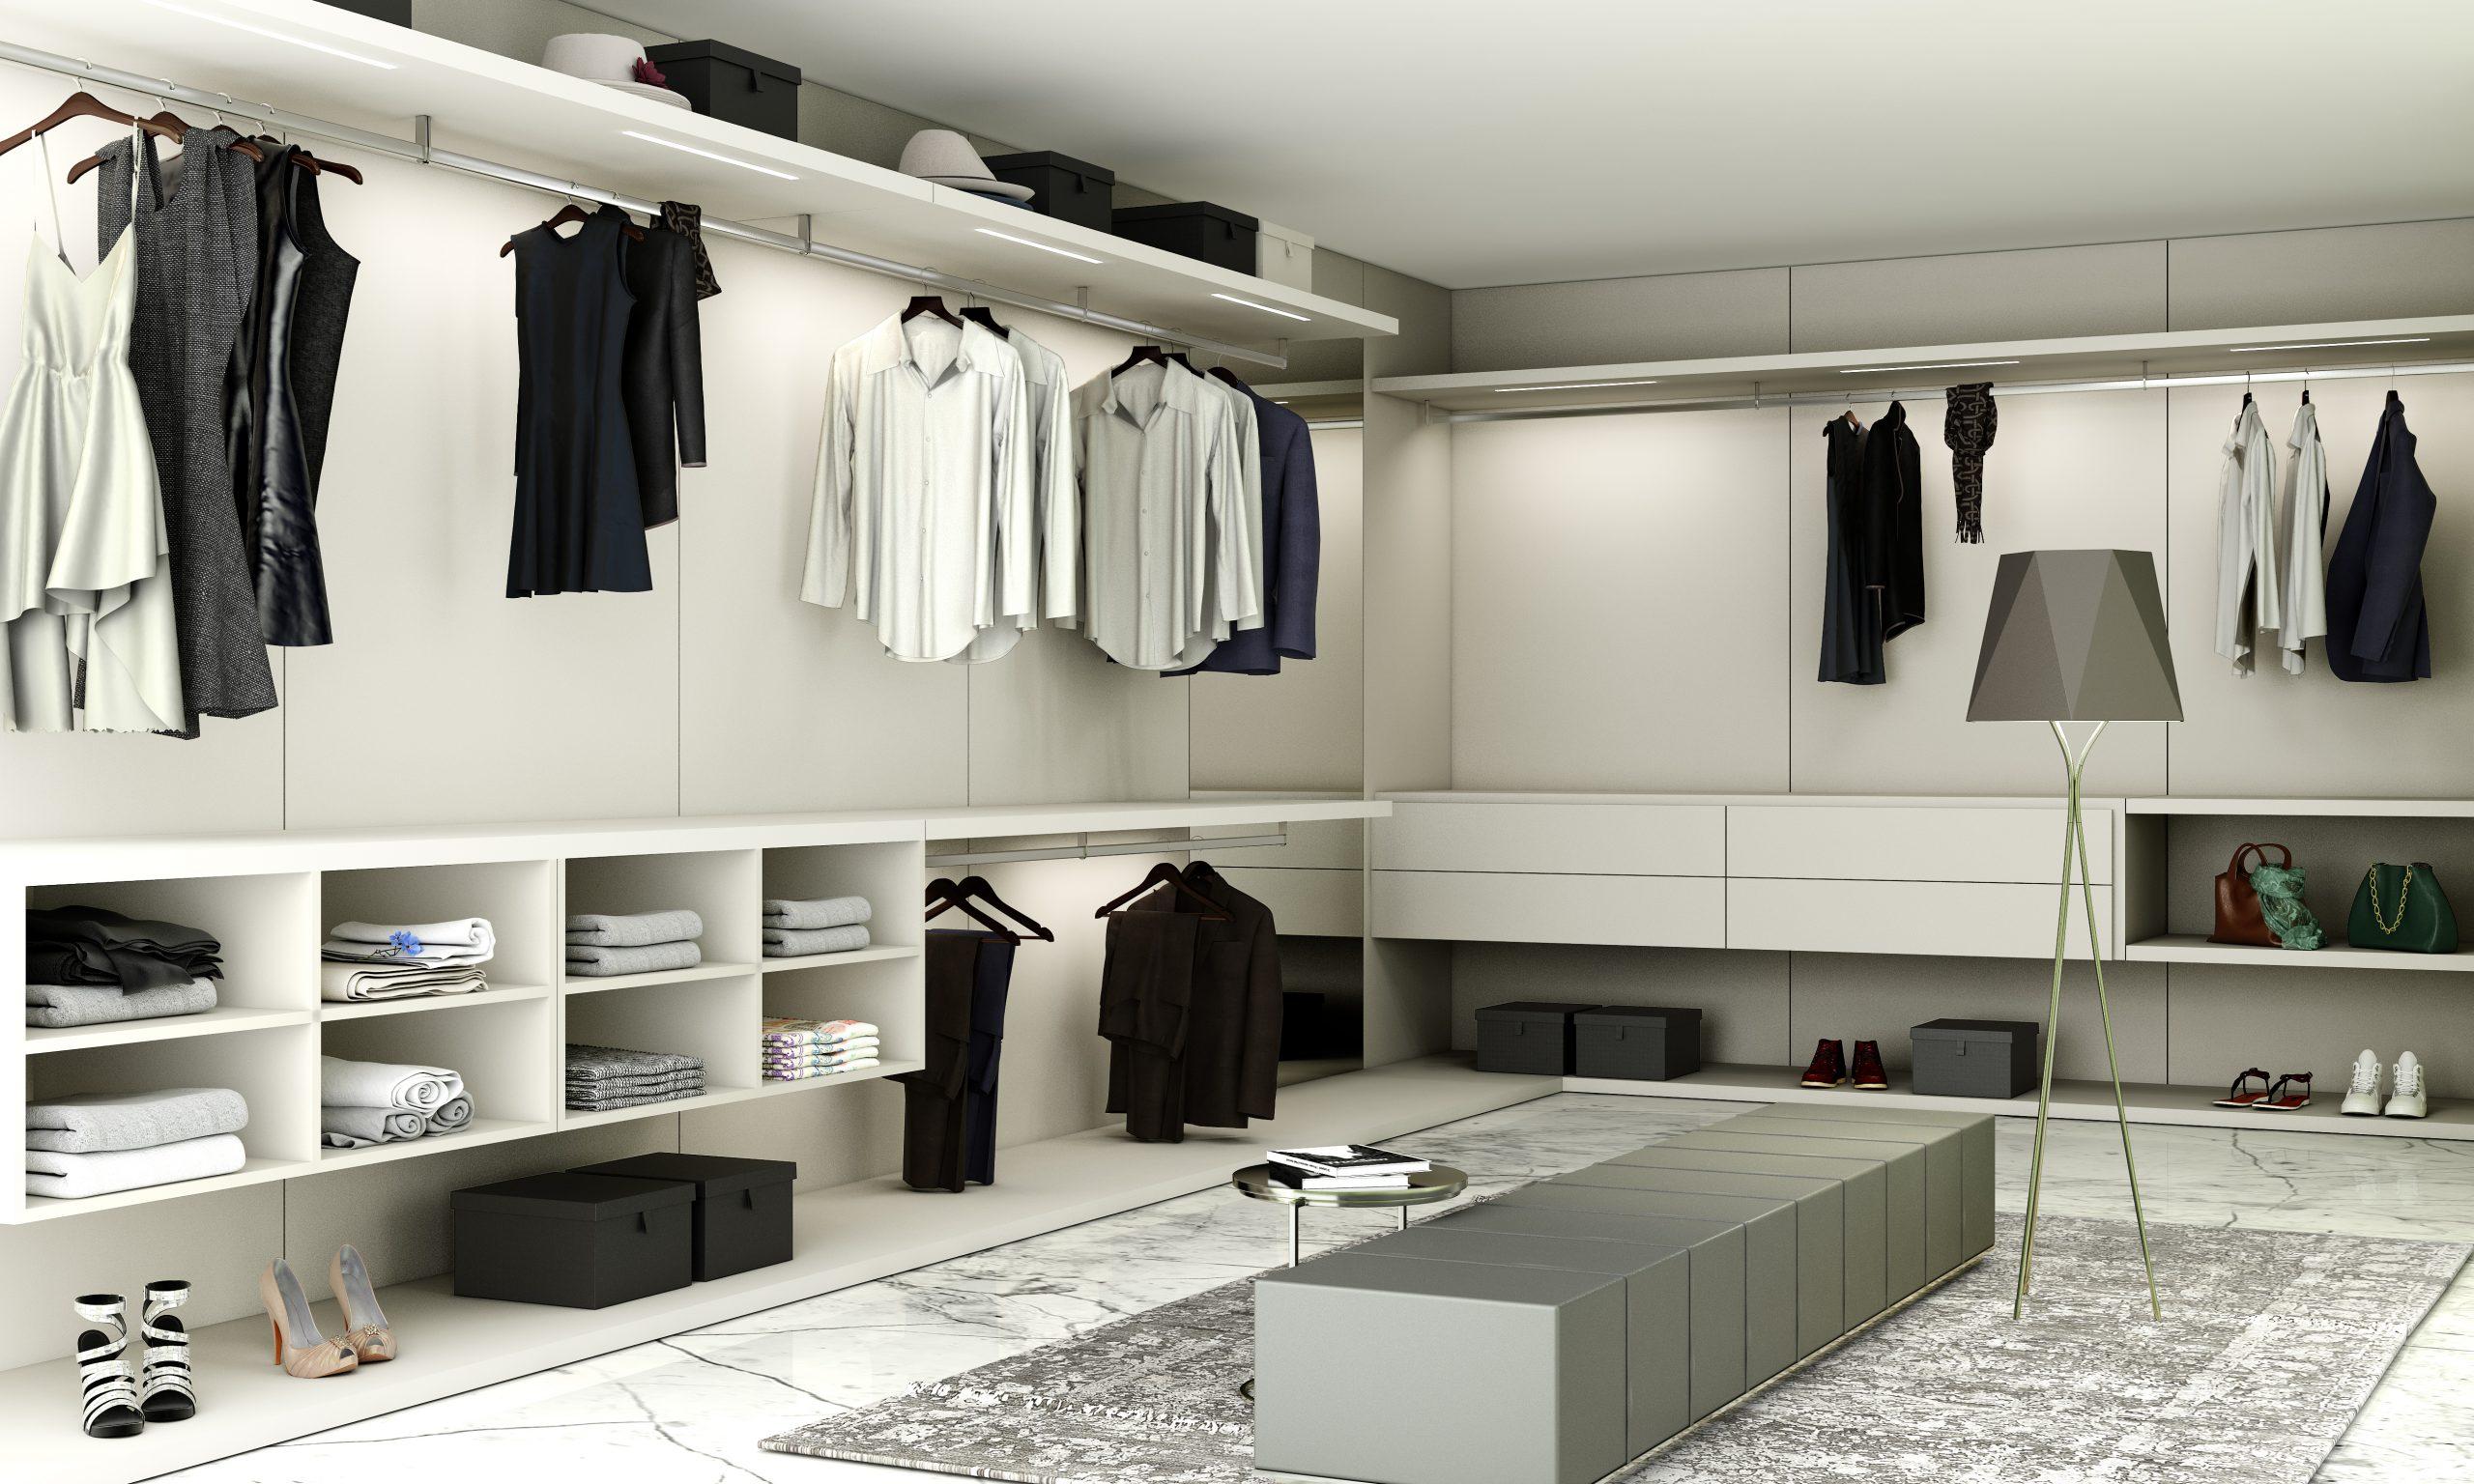 Luxury Walk-in Wardrobe in Light Grey Matt Finish